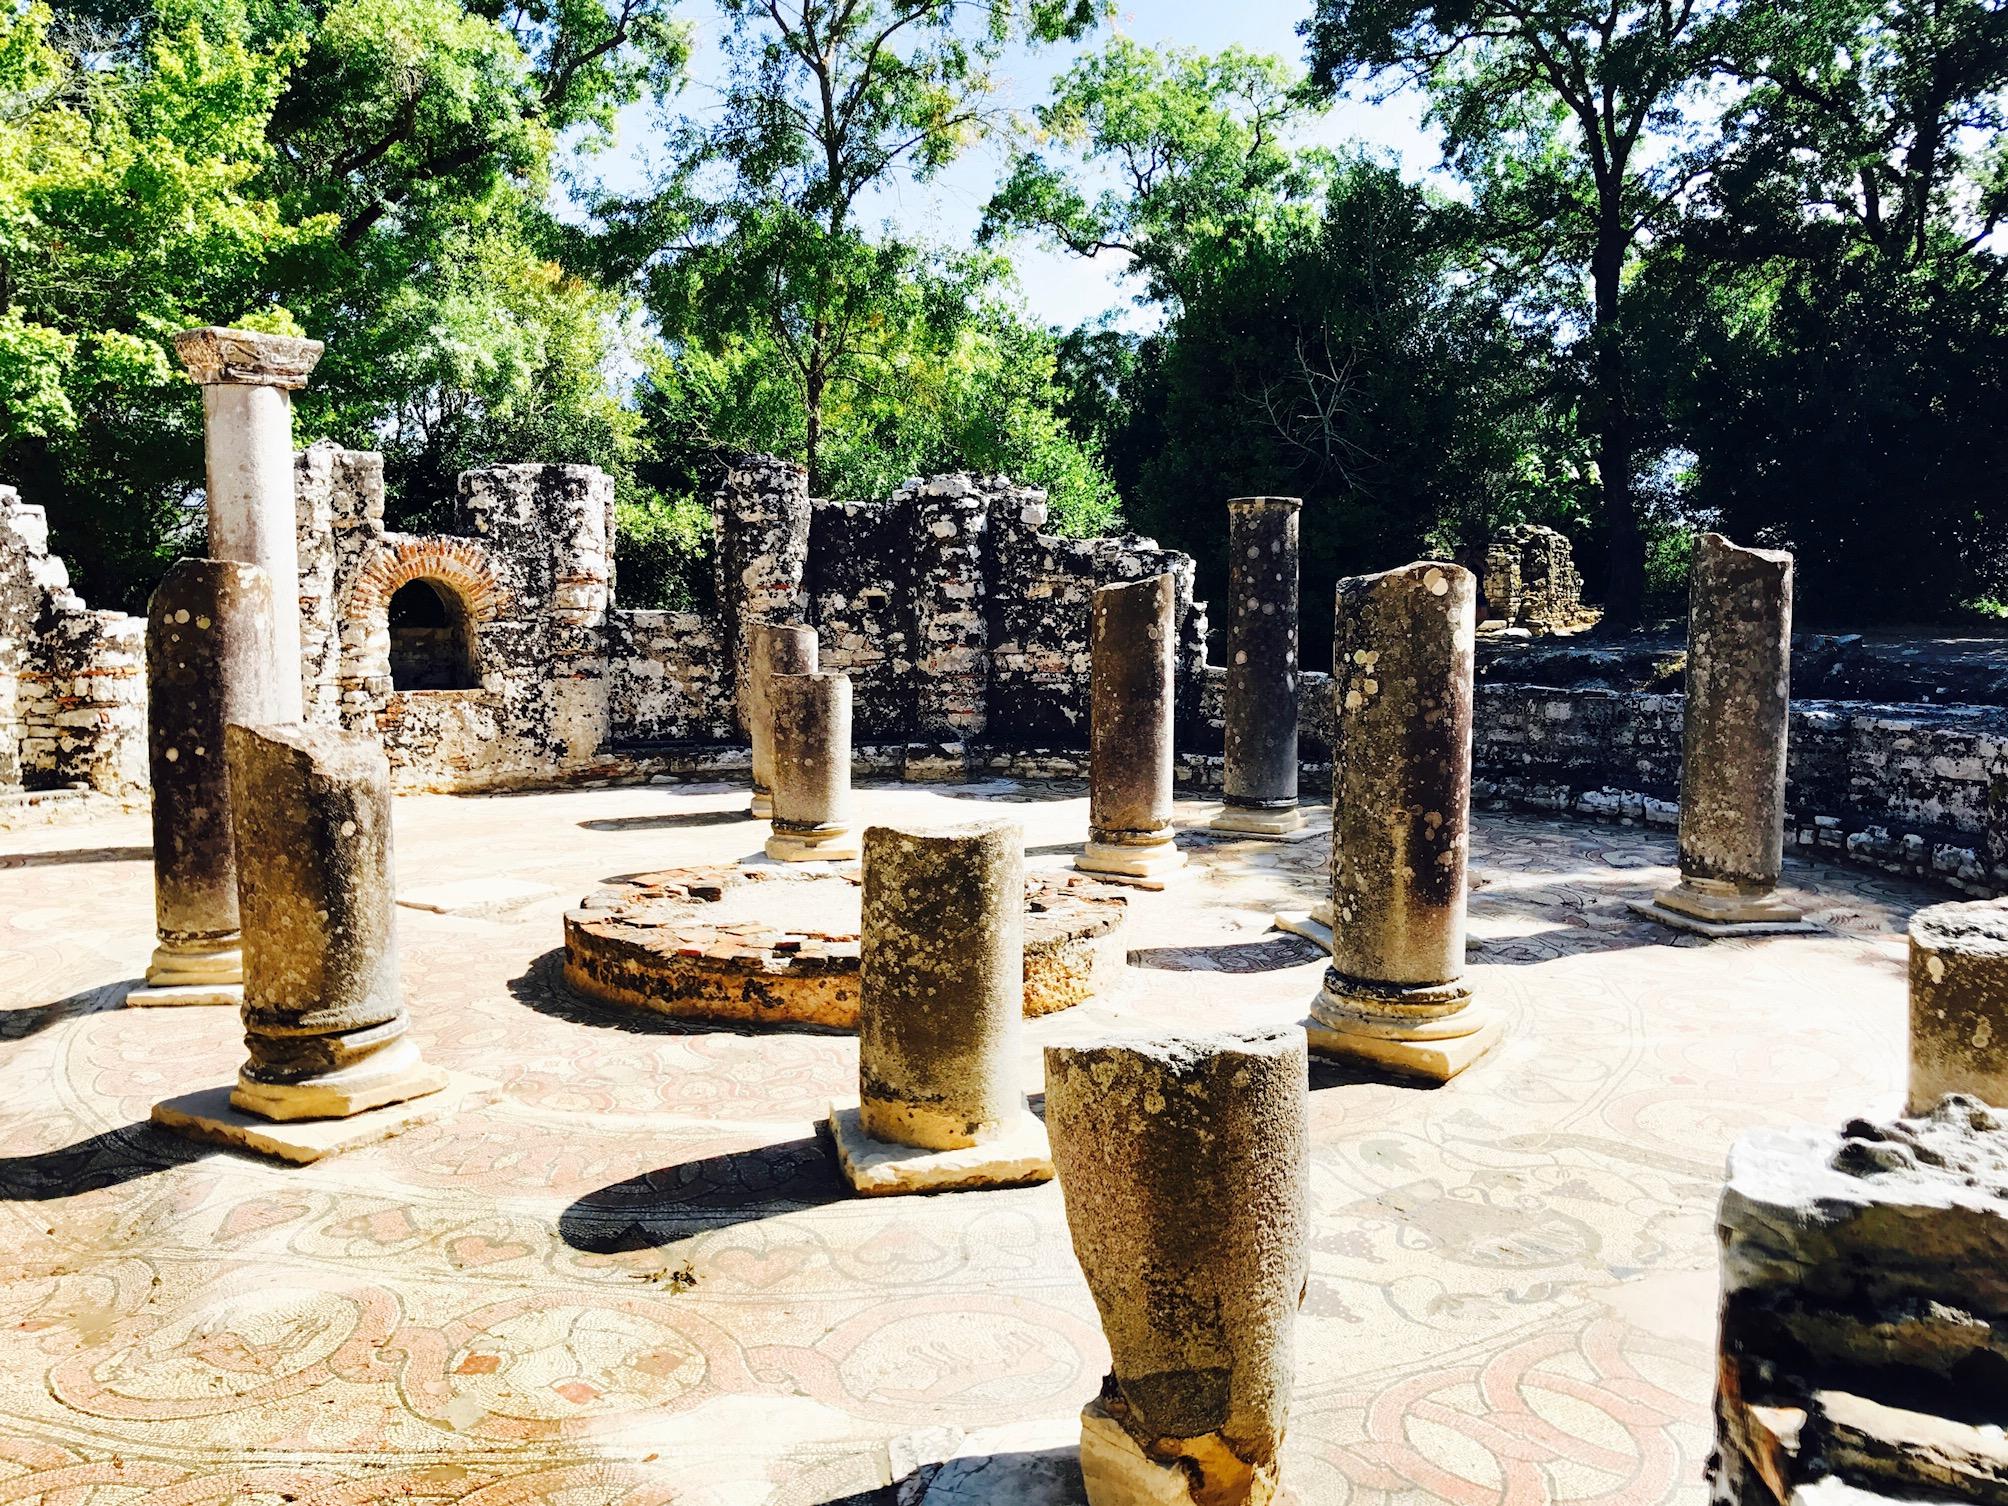 Blick auf dei Ausgrabungsstätte Butrint